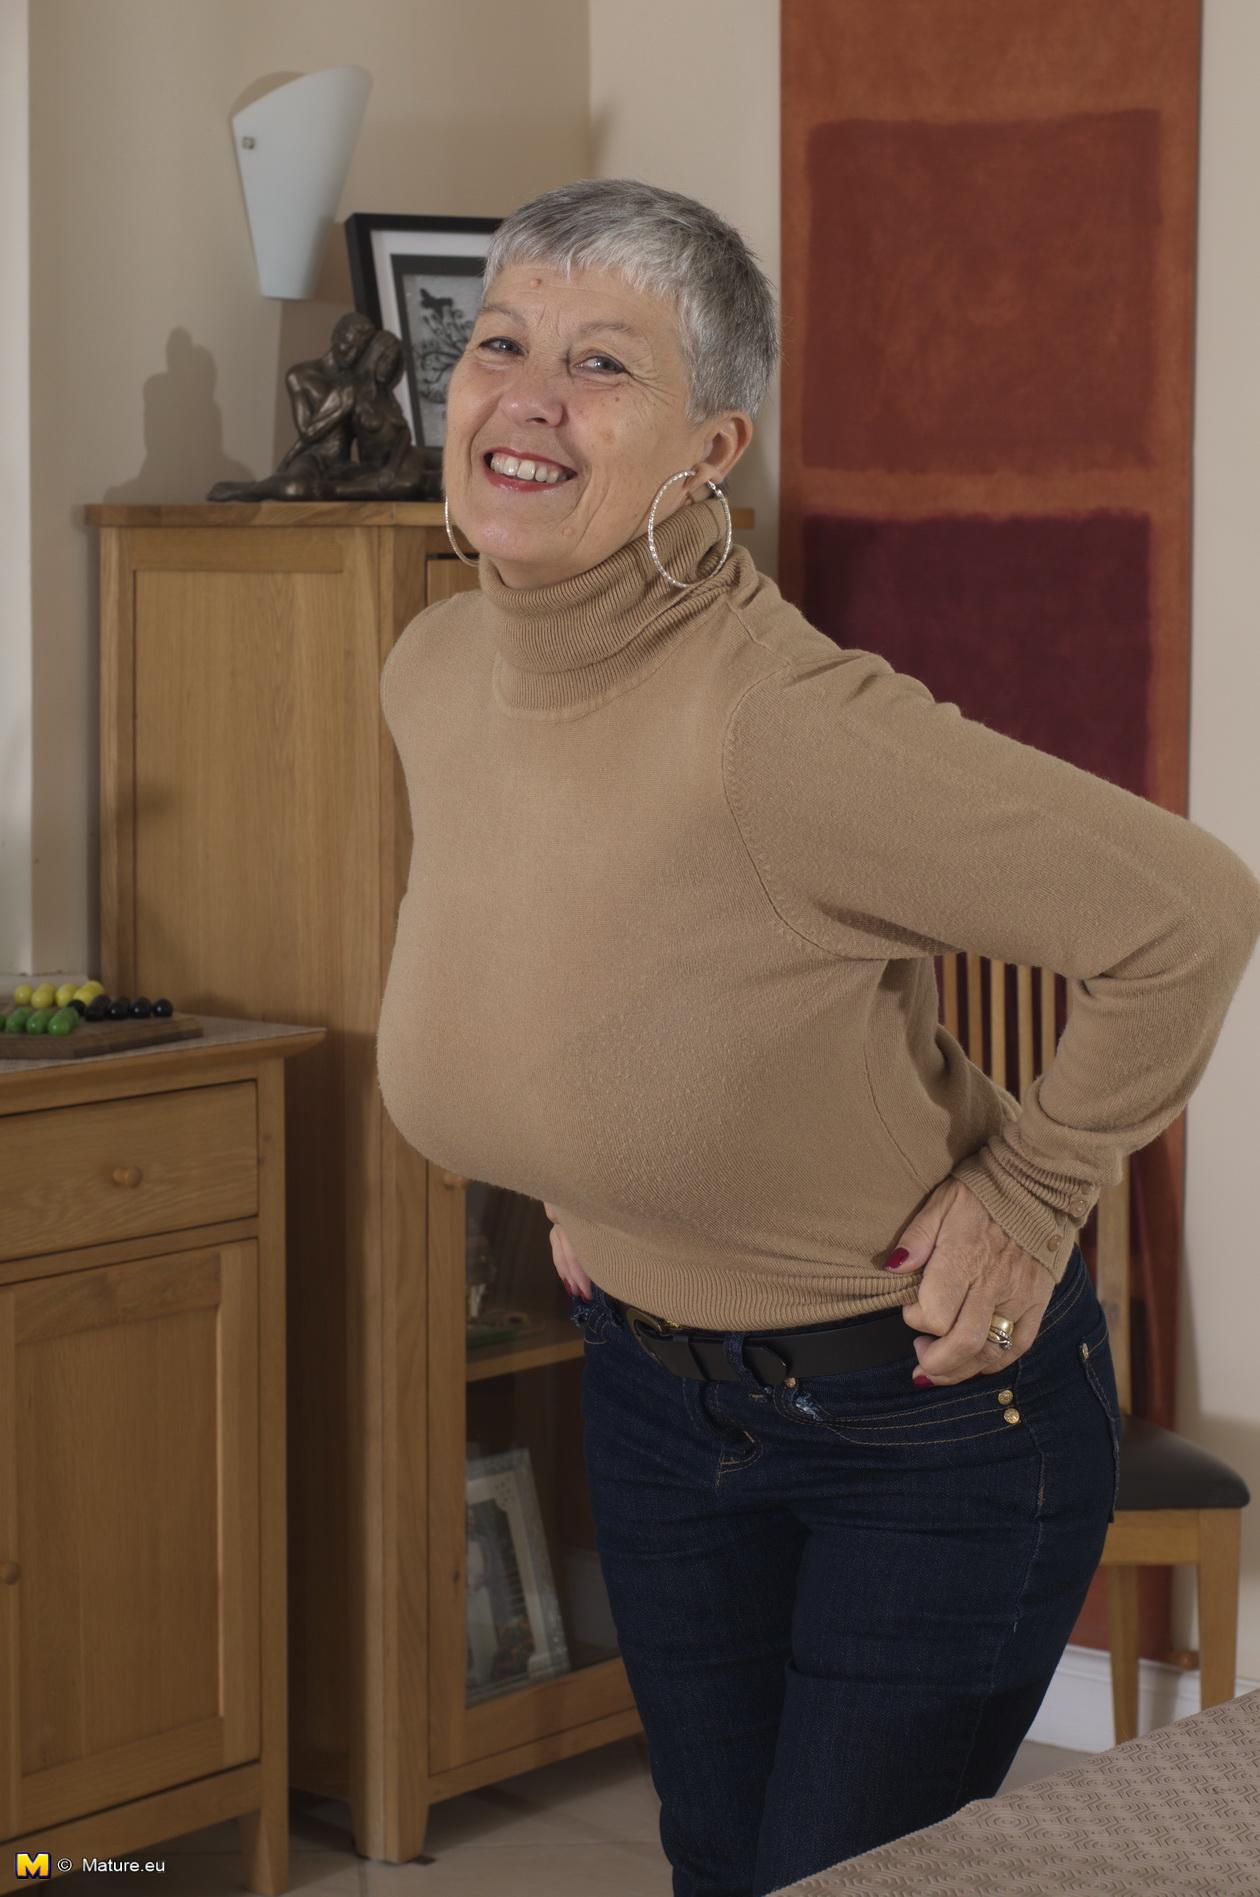 Wife gilf jan blowjob after brunch - 2 7